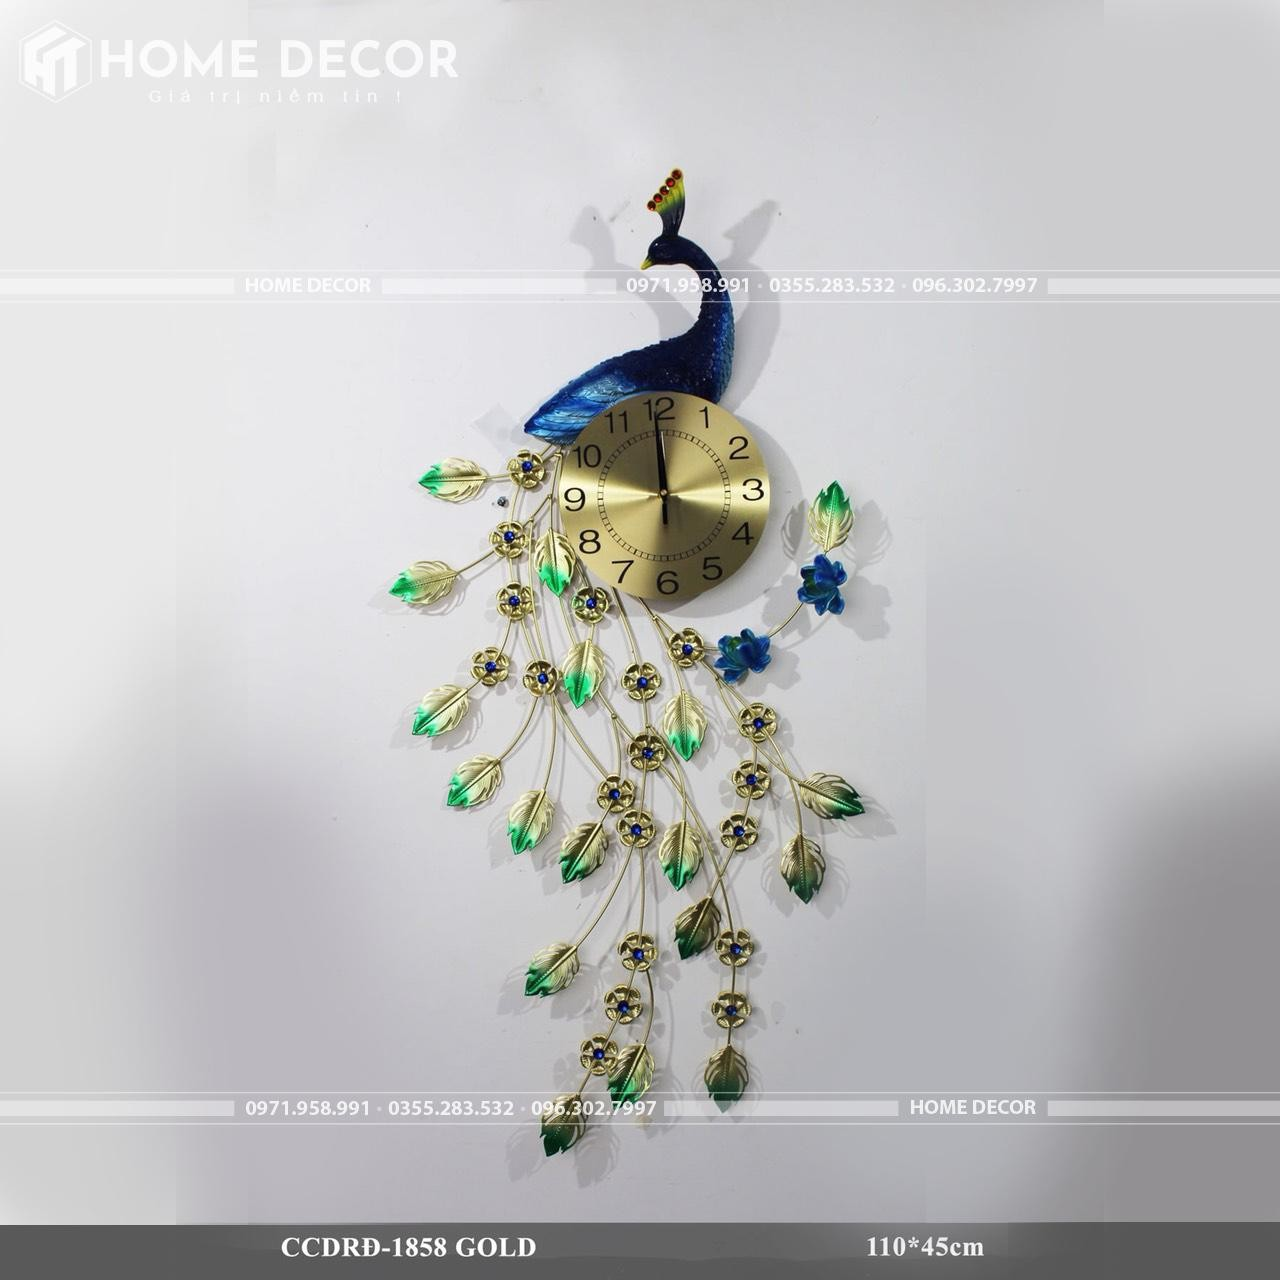 đồng hồ decor HT-1858 GOLD